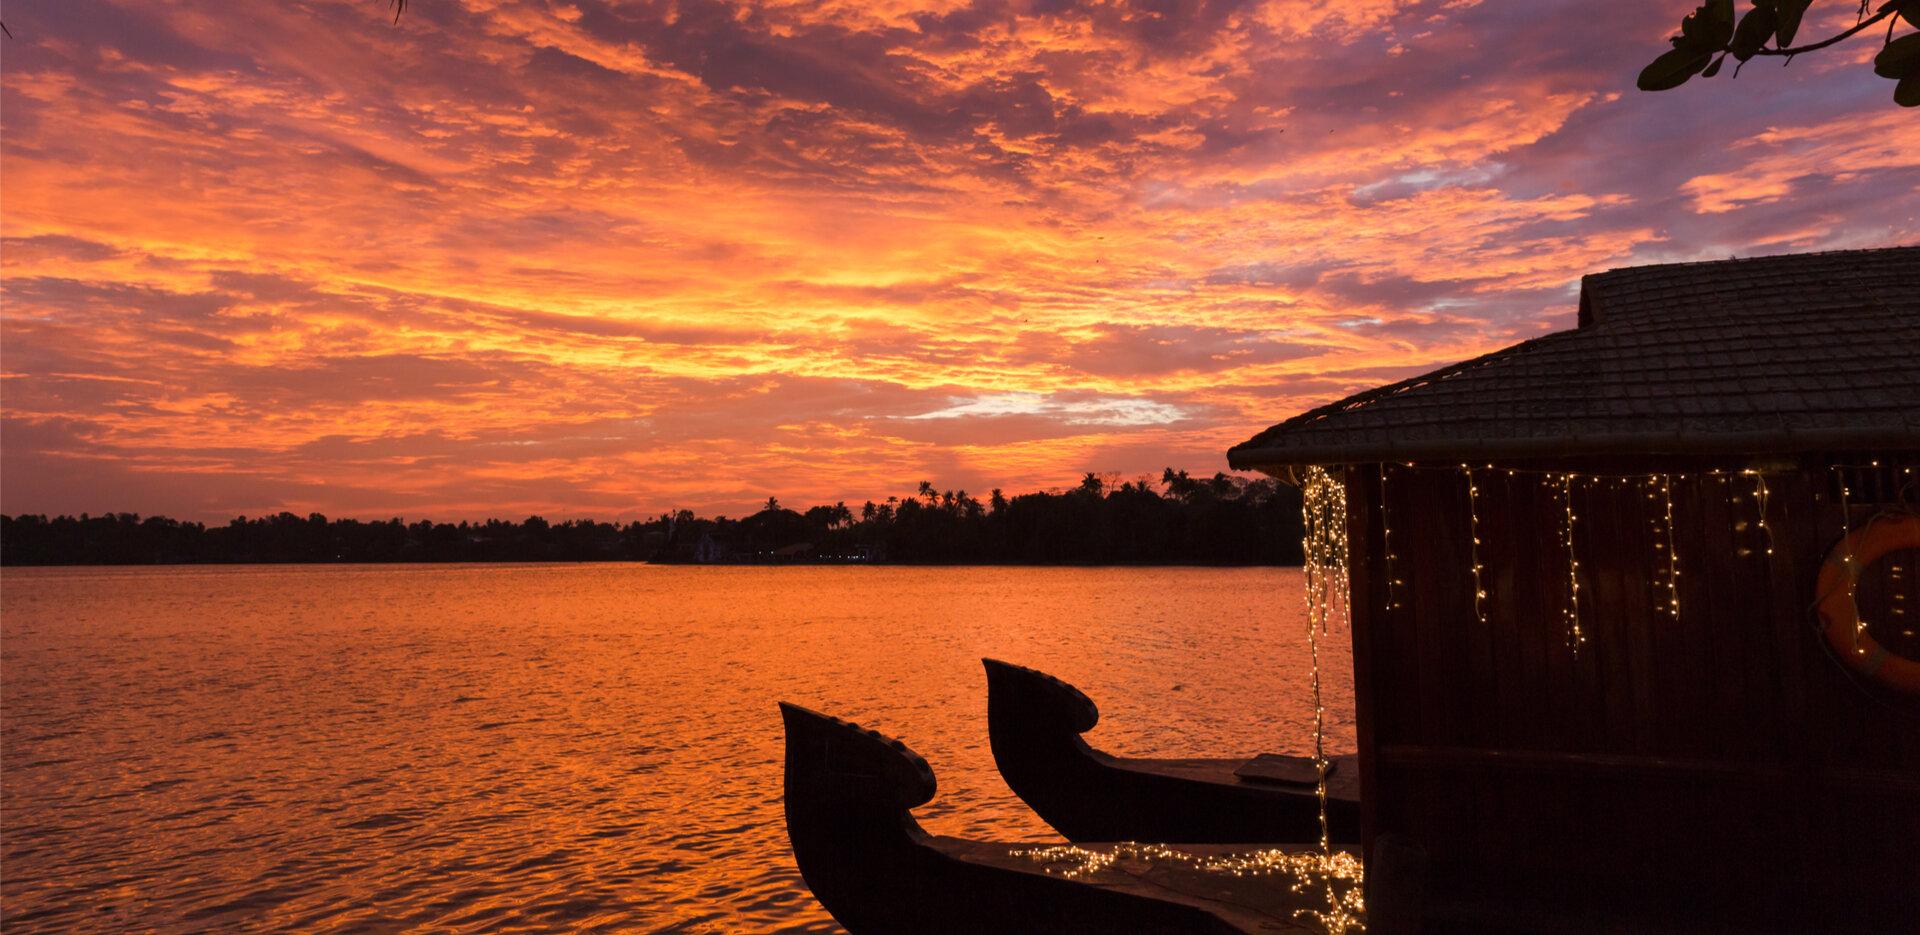 Munroe Island - The Venice of India